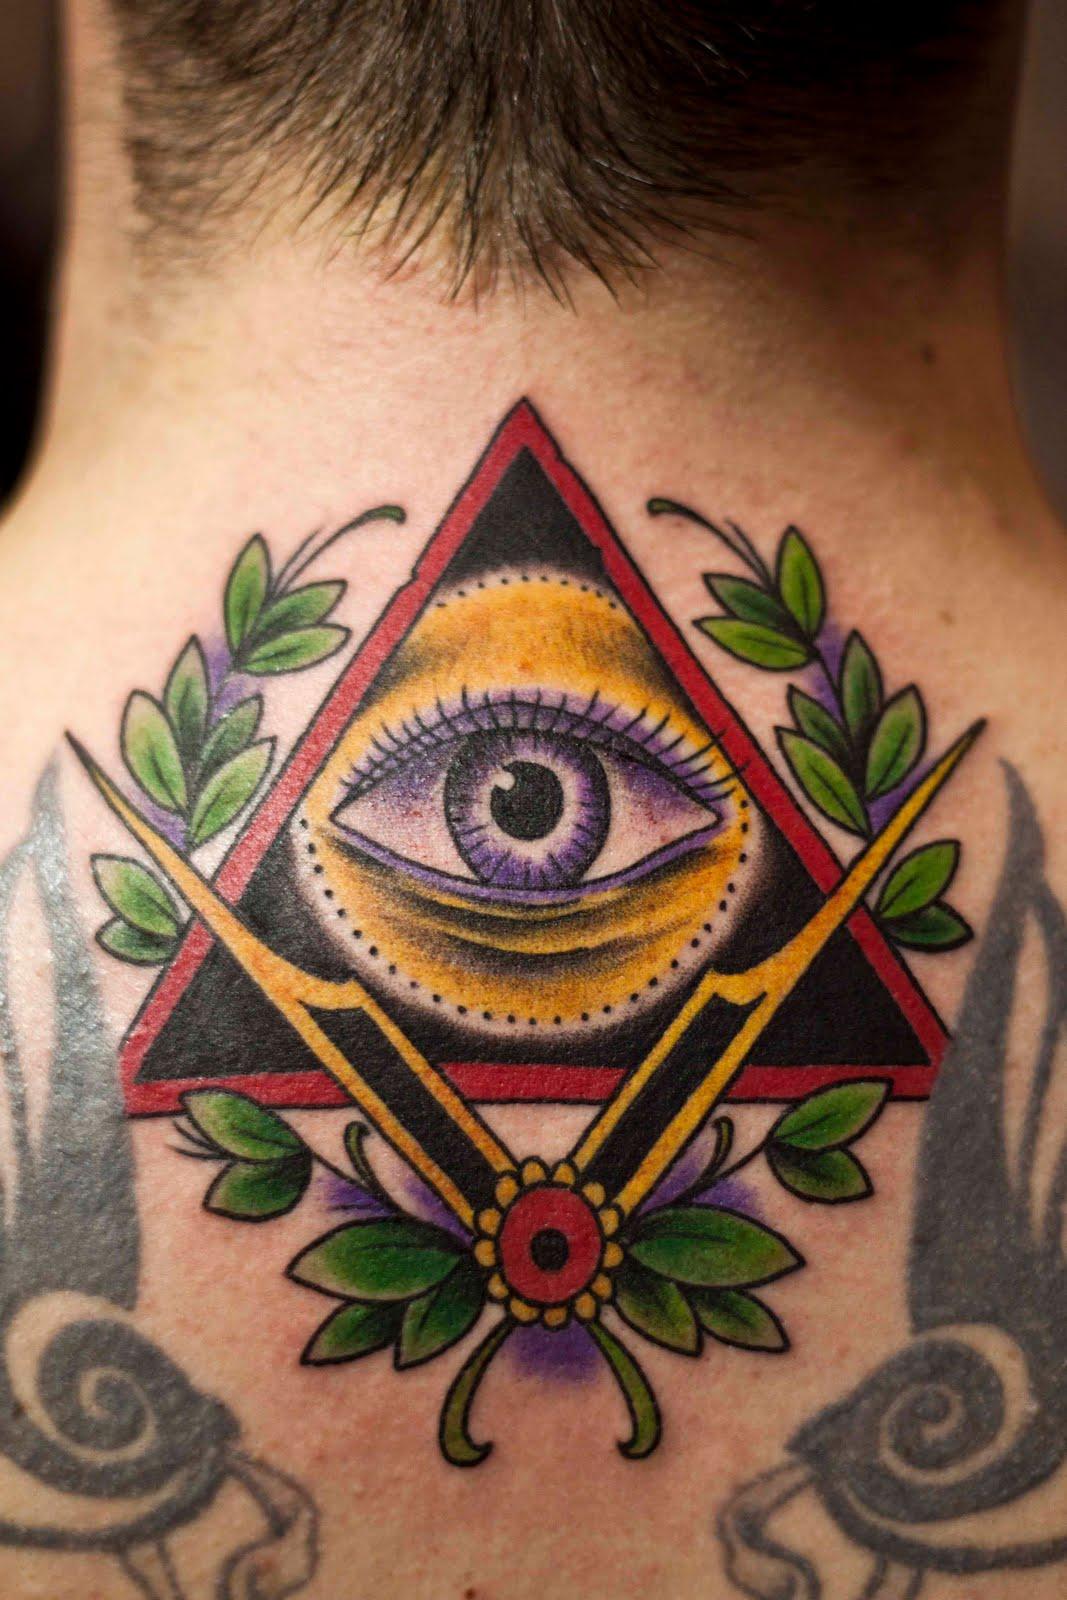 http://4.bp.blogspot.com/-Gs-RndvkwGI/Ta5nu6vgg6I/AAAAAAAAAVQ/ceA36BJN3YQ/s1600/illuminati.jpg